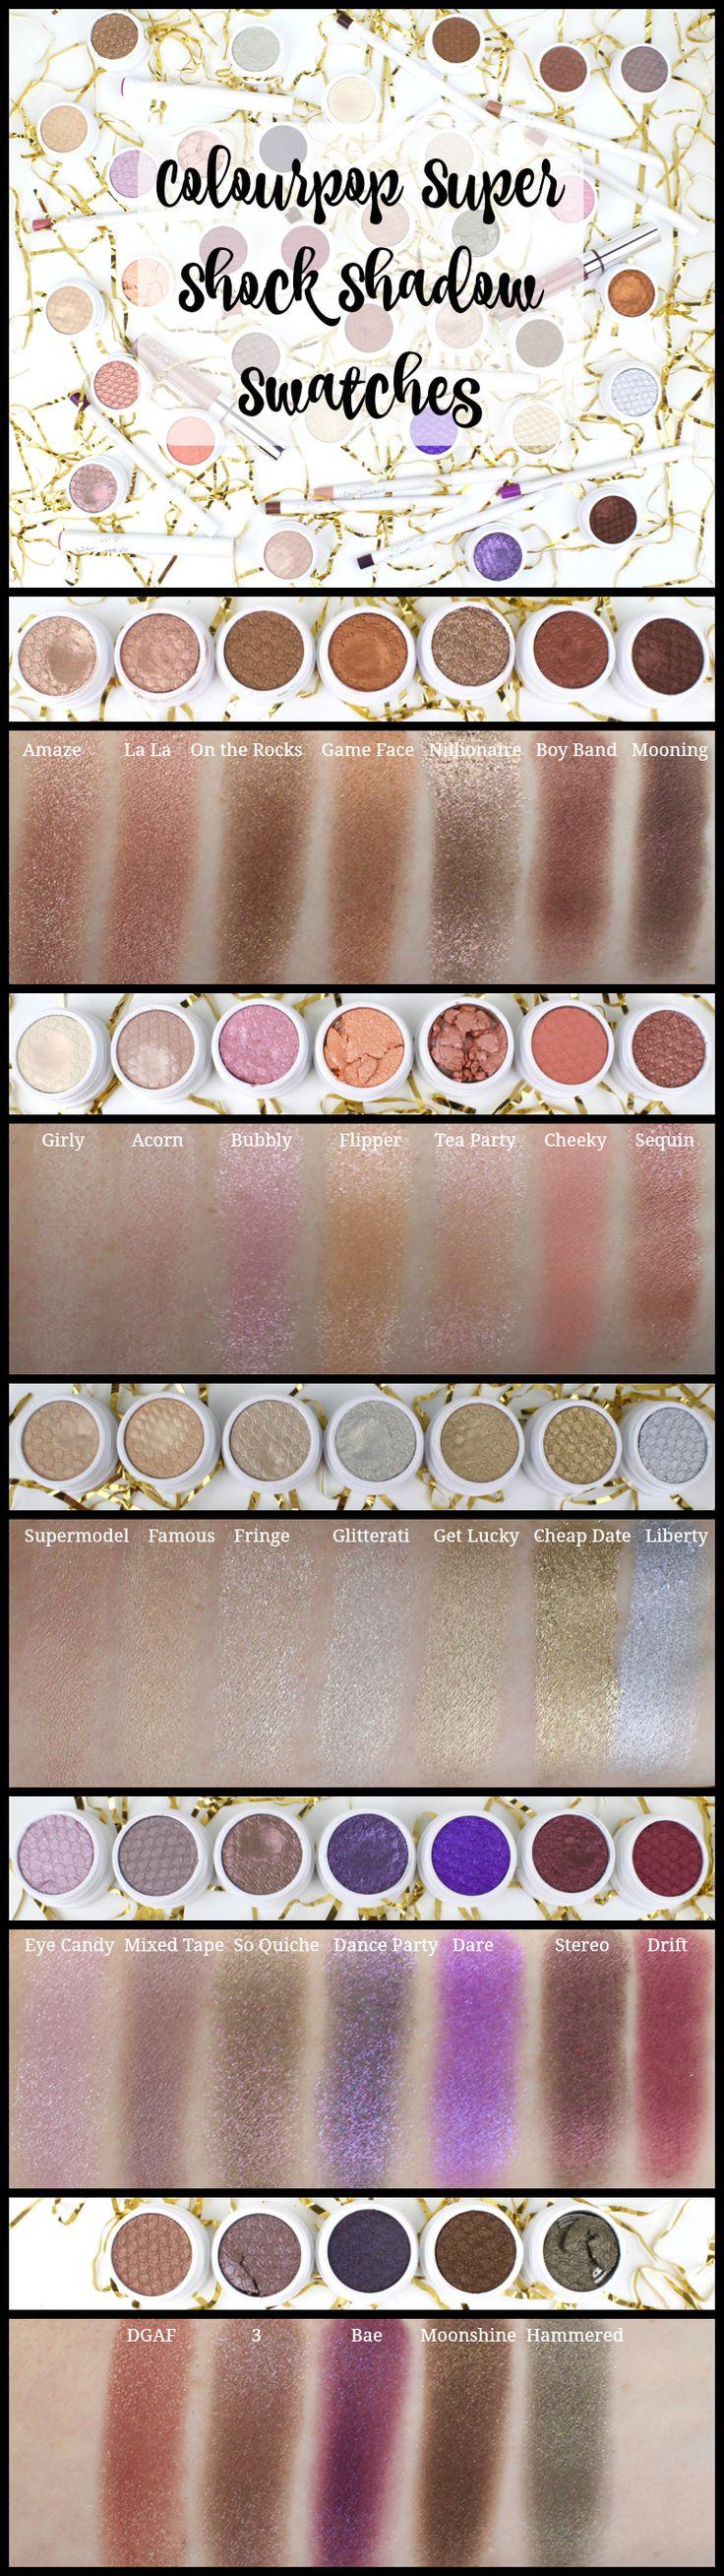 My Recent Beauty Splurge | Huge Colourpop Haul!